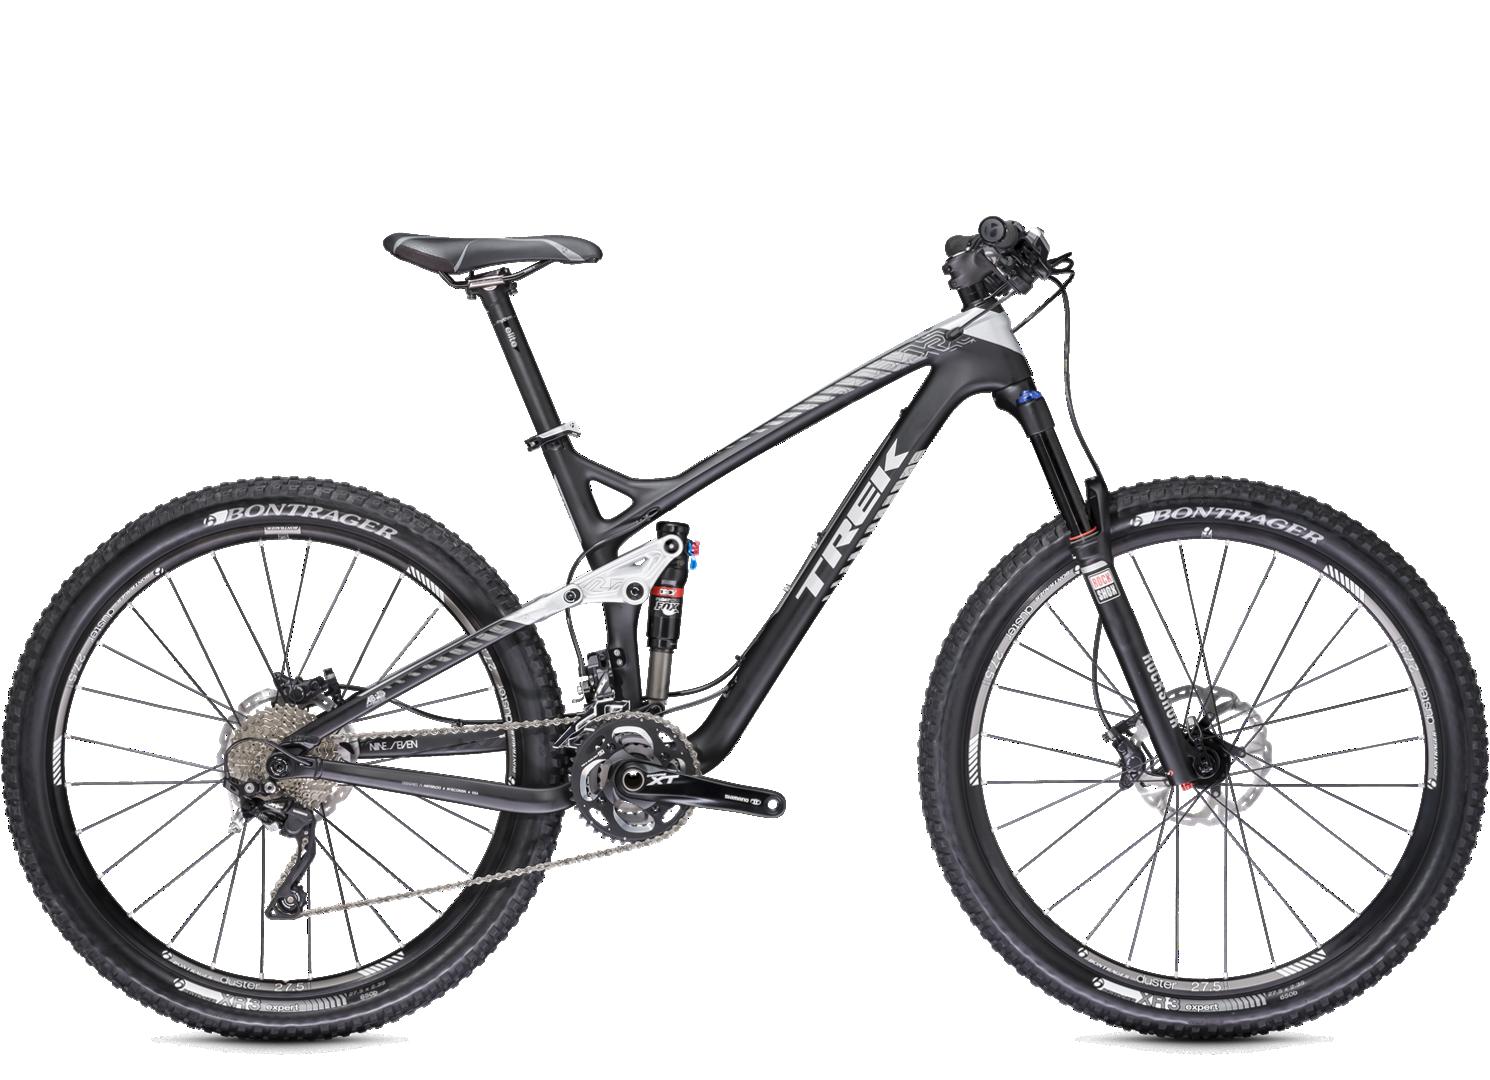 2014 Remedy 9.7 27.5/650b - Bike Archive - Trek Bicycle